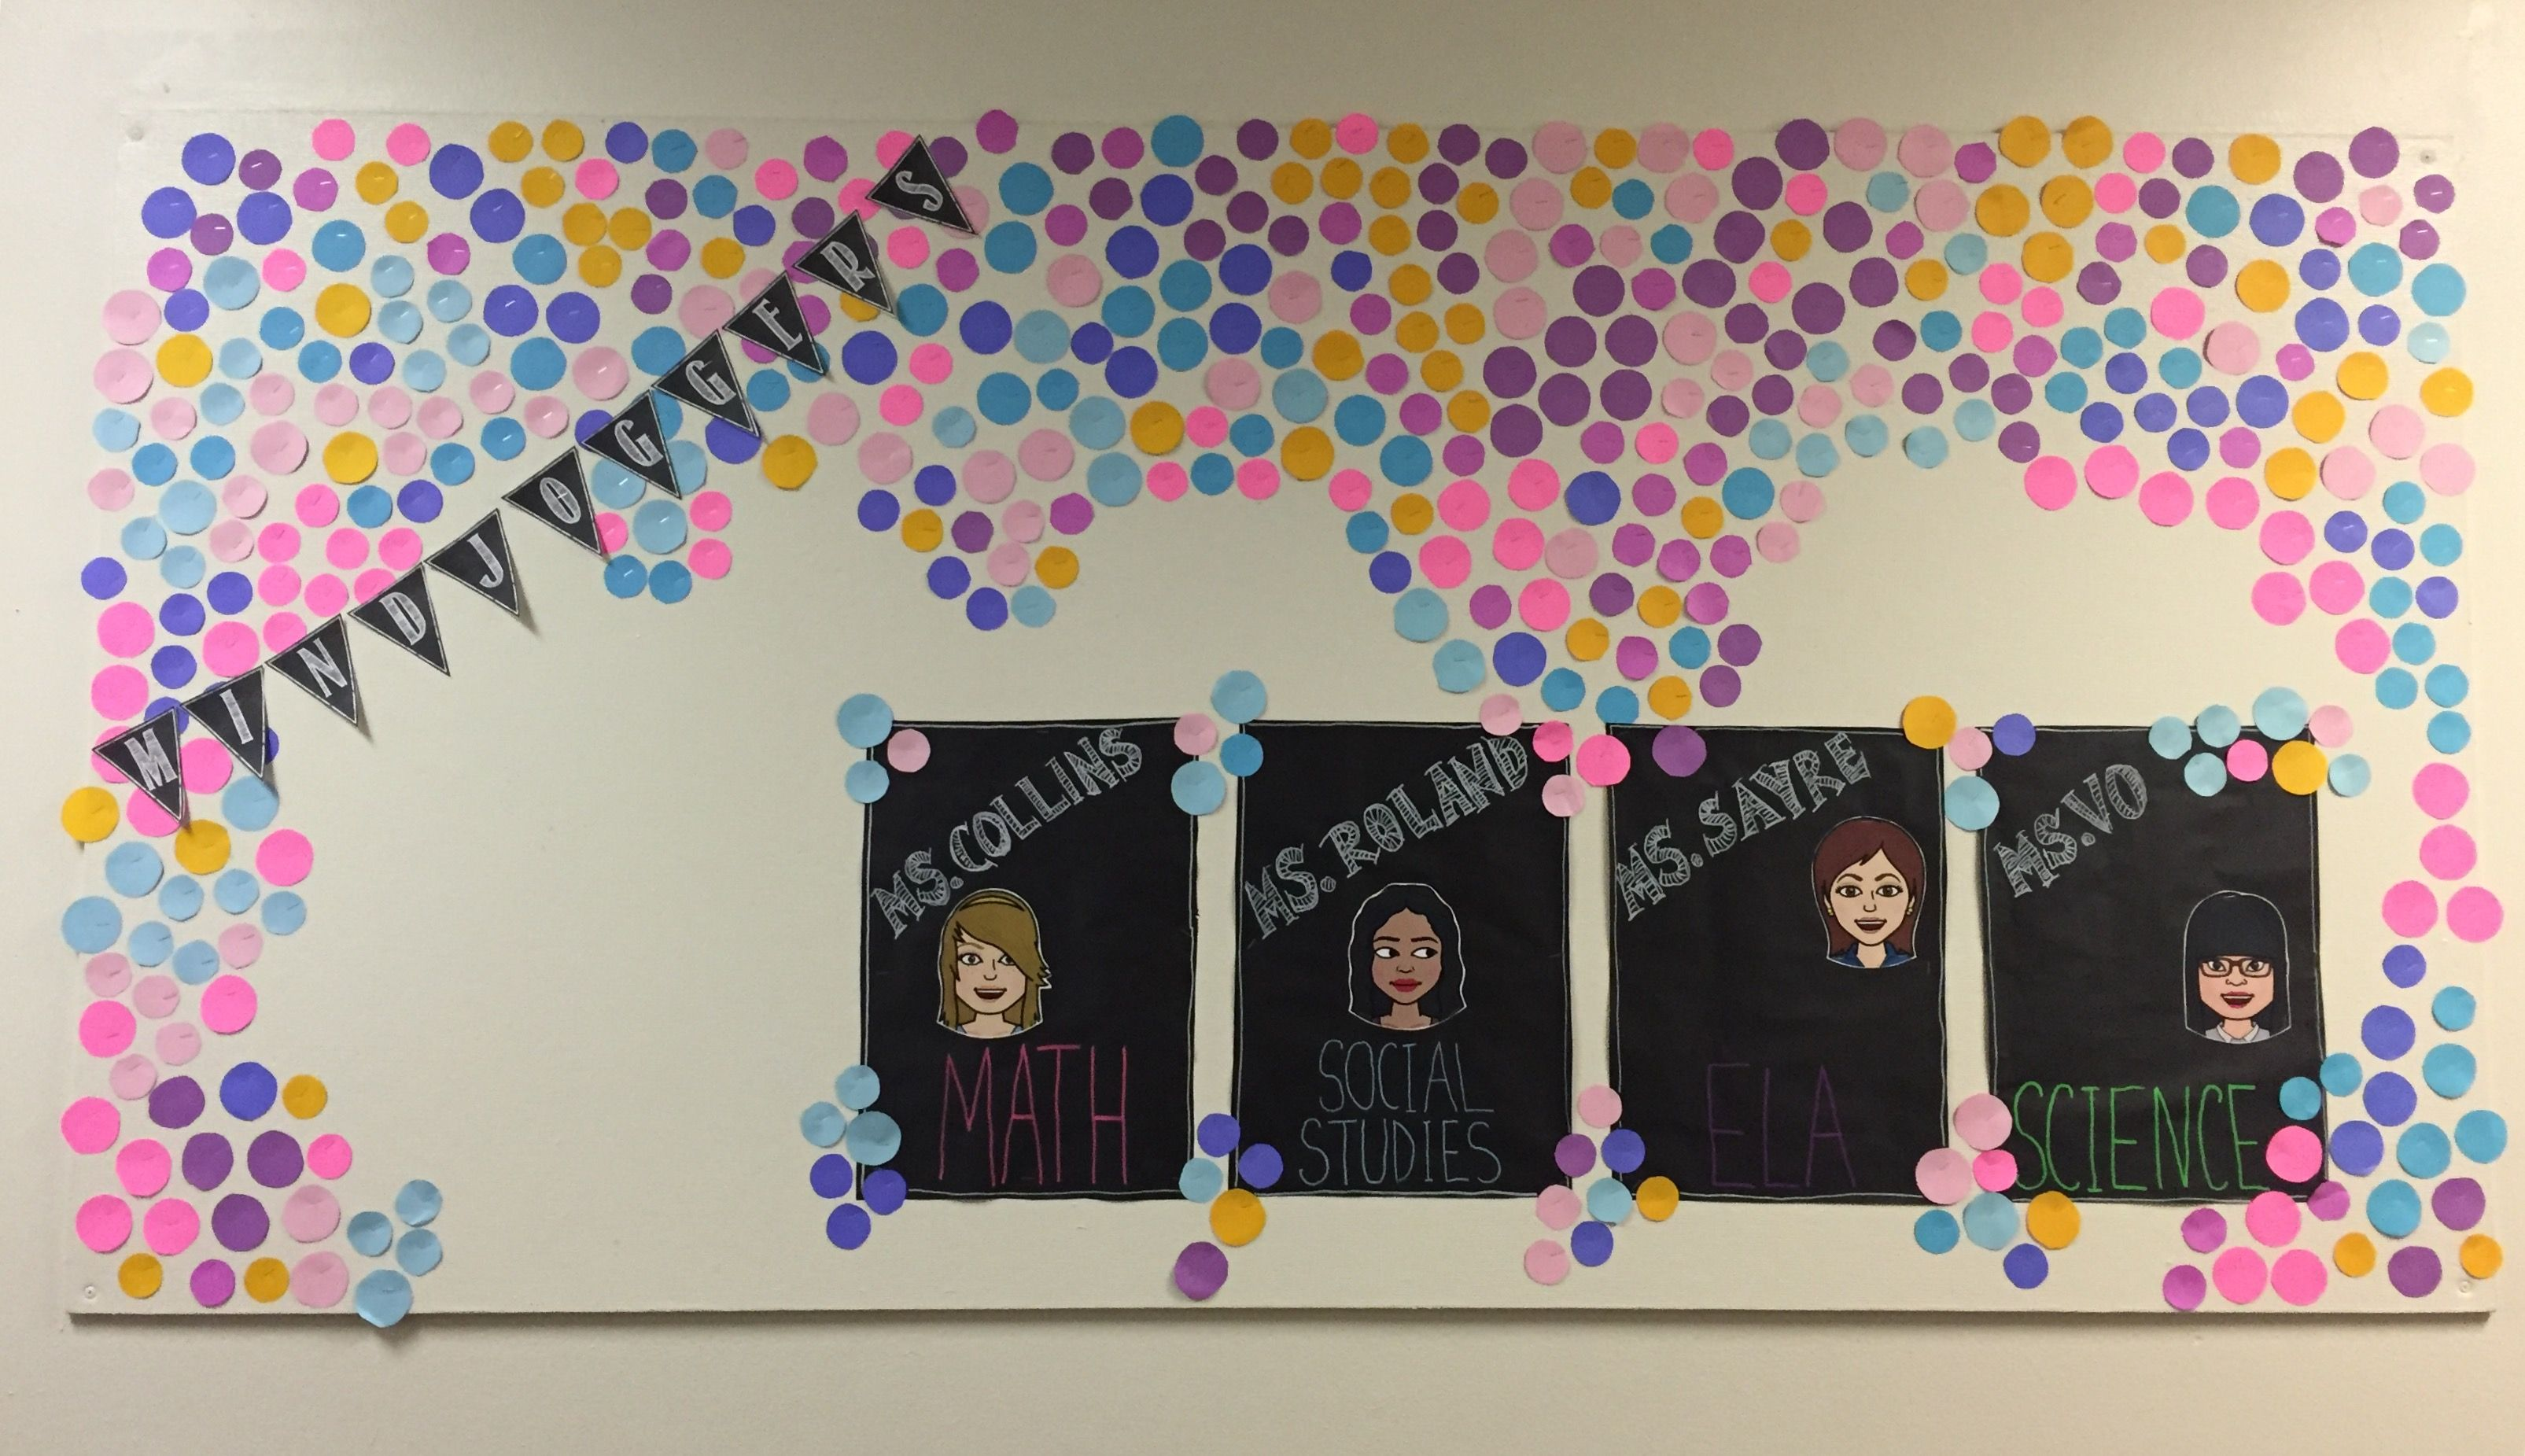 Creative Bulletin Board To Feature Teaching Team With Bitmojis